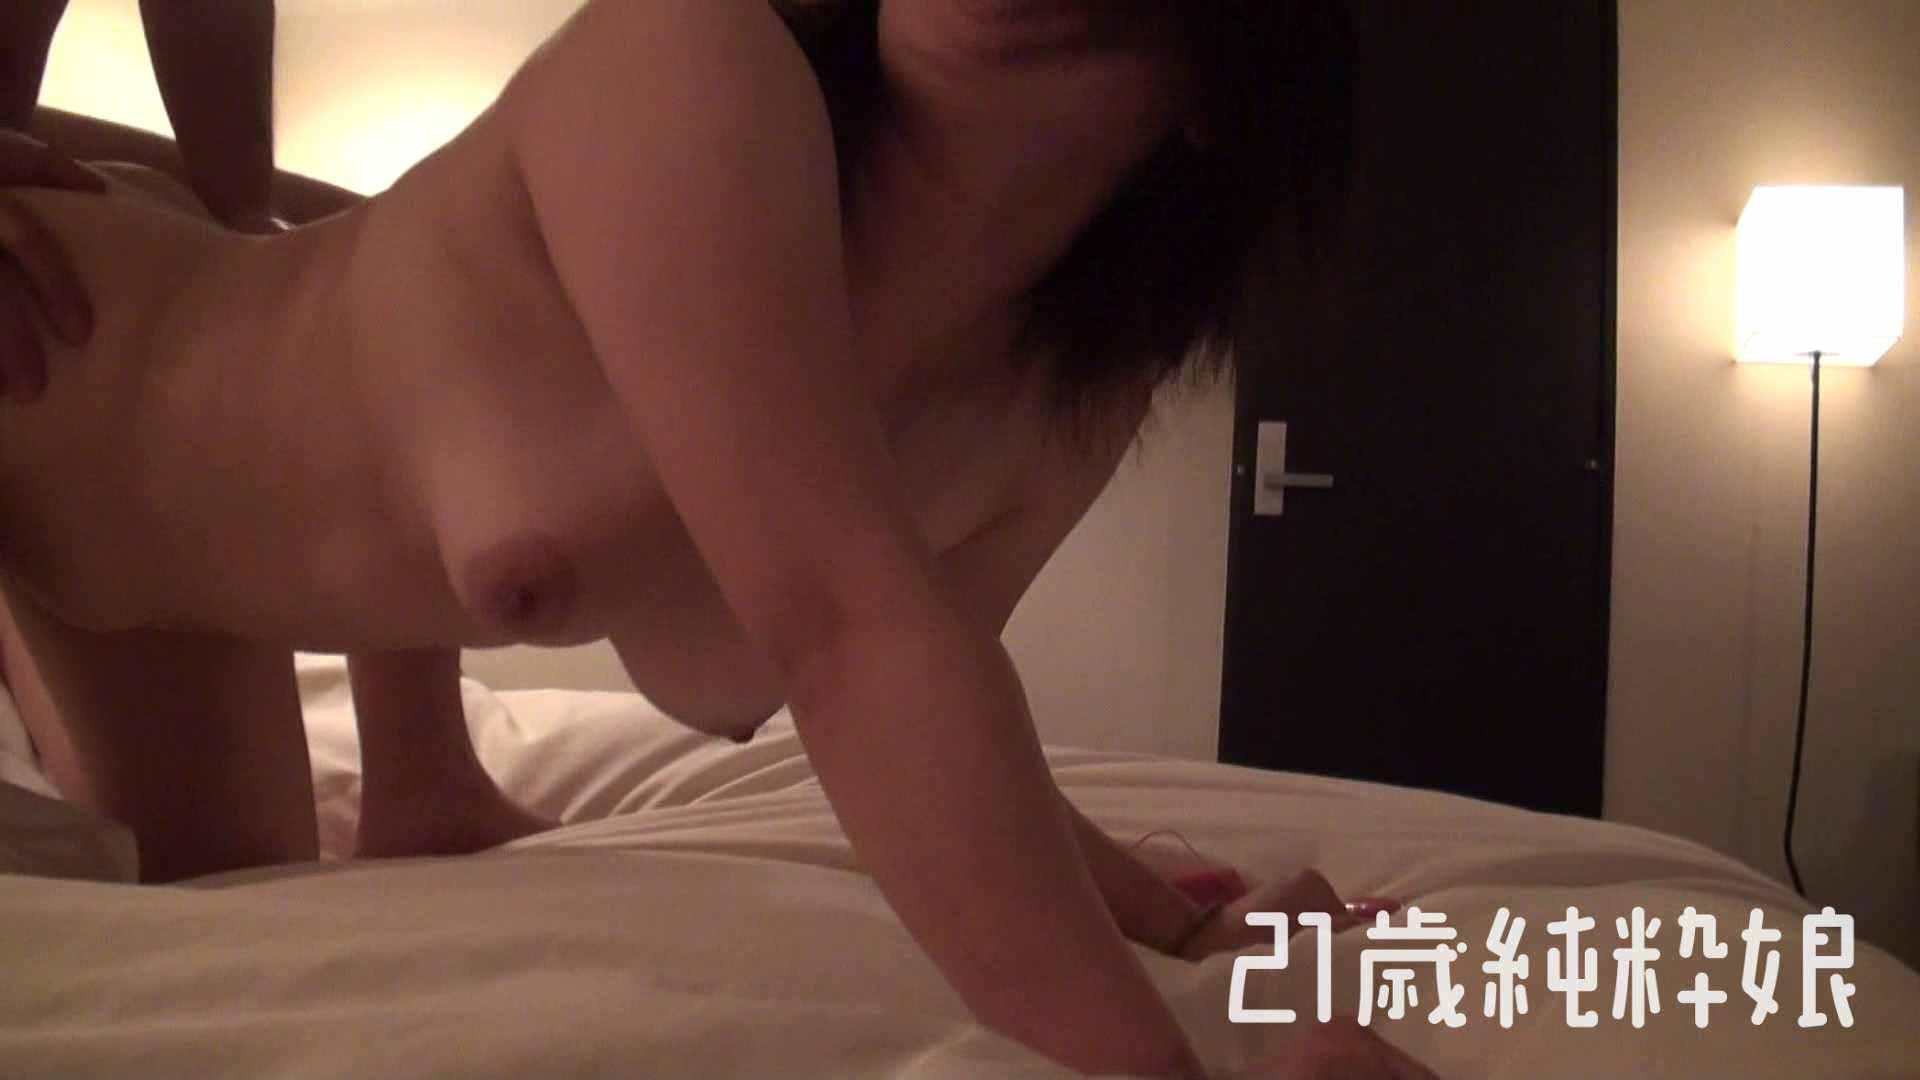 Gカップ21歳純粋嬢第2弾Vol.4 一般投稿 おまんこ無修正動画無料 69枚 29